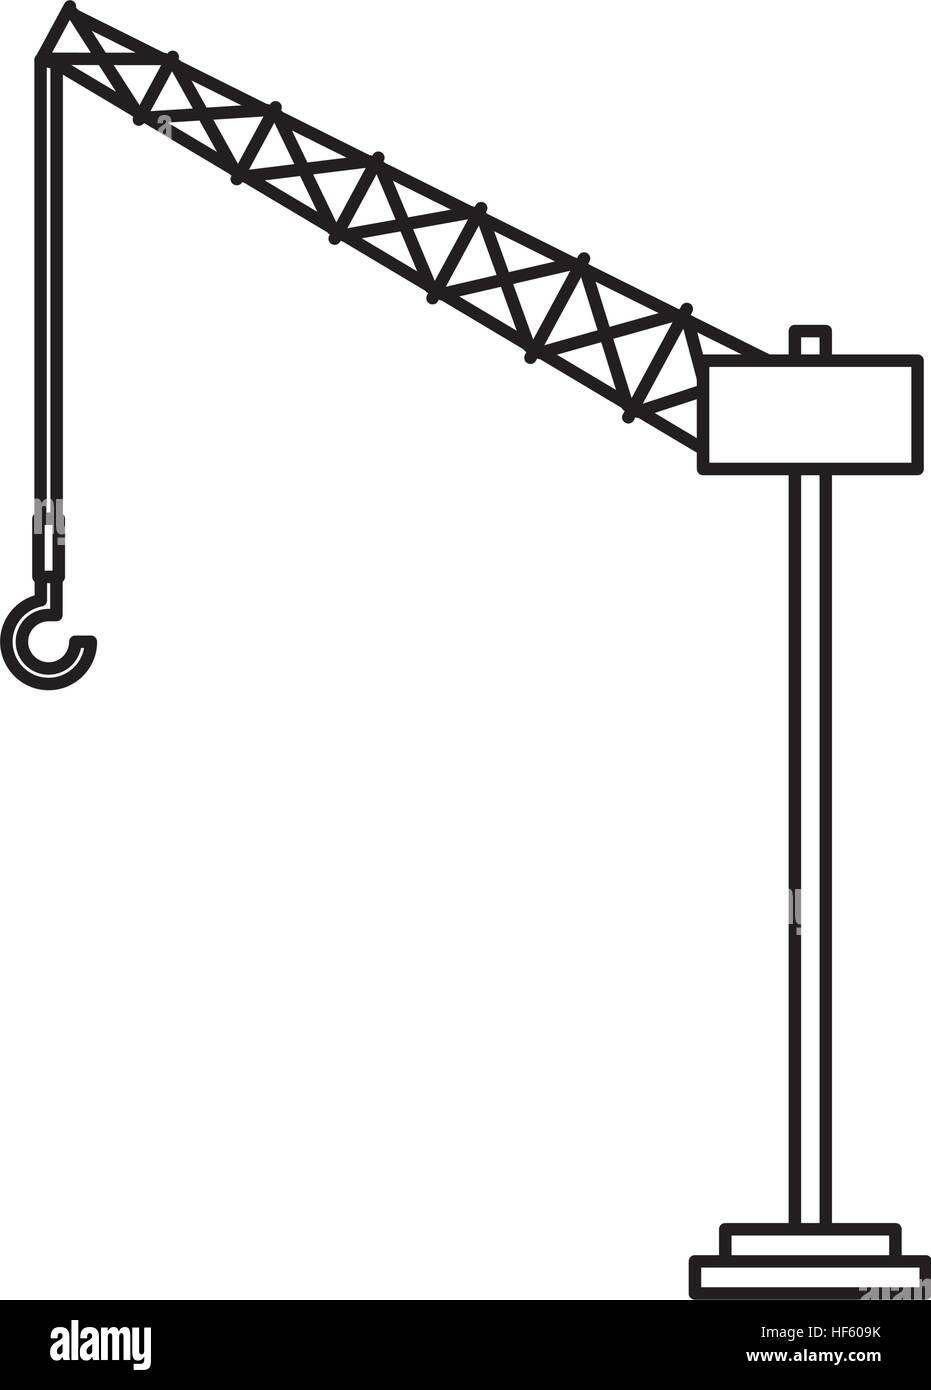 Tower Crane Design : Tower crane service icon vector illustration design stock